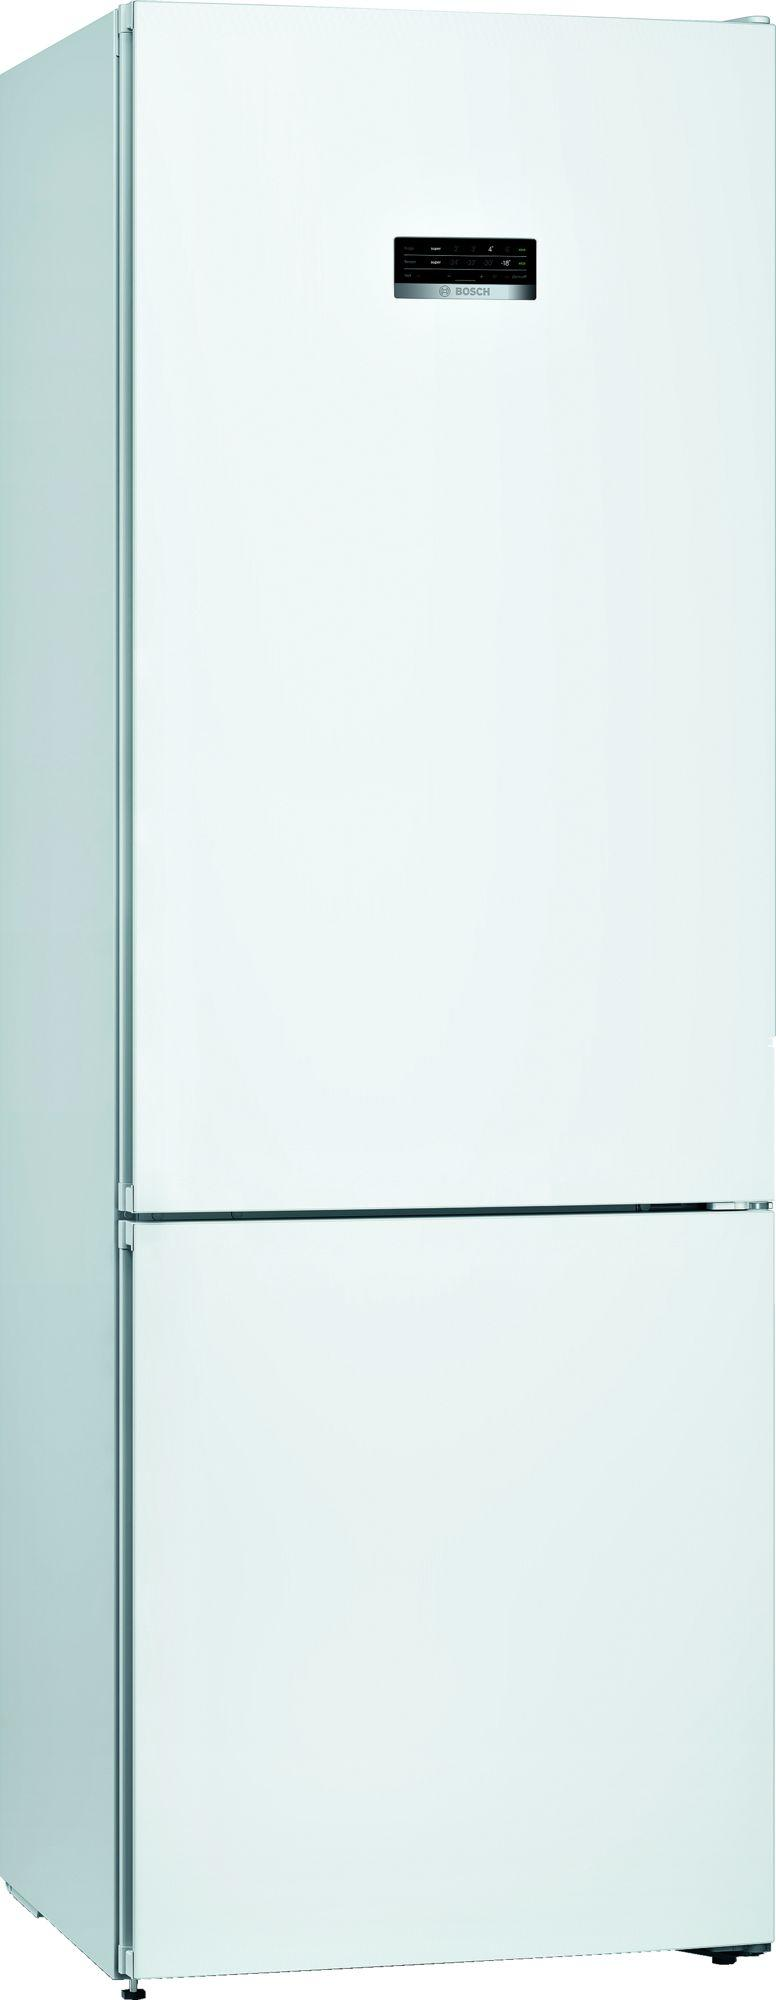 Image of Serie 4 KGN49XWEA 70cm 435 Litre Frost Free Fridge Freezer | White